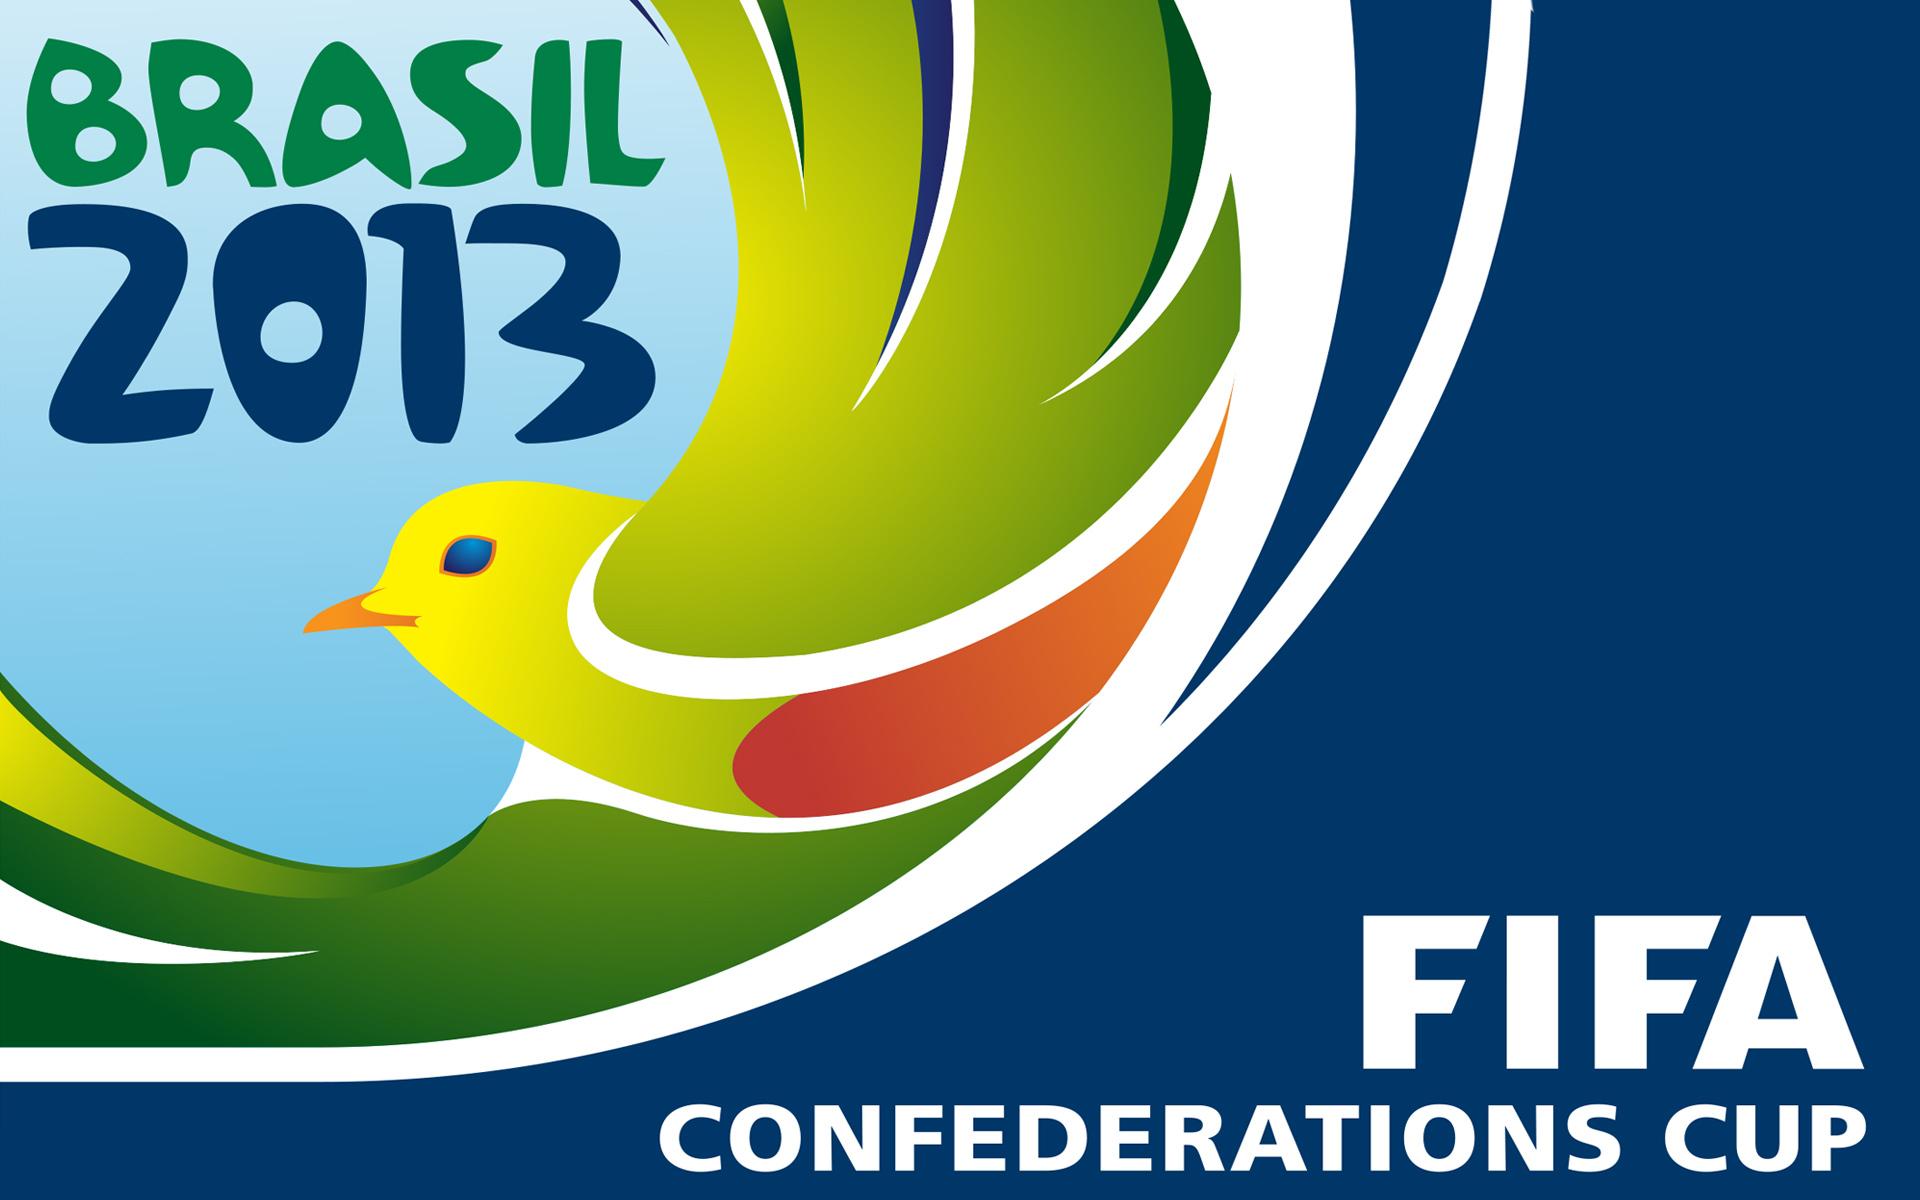 ConfederationsCup2013LiveStream3AViewingInfoforGroupAMatchups